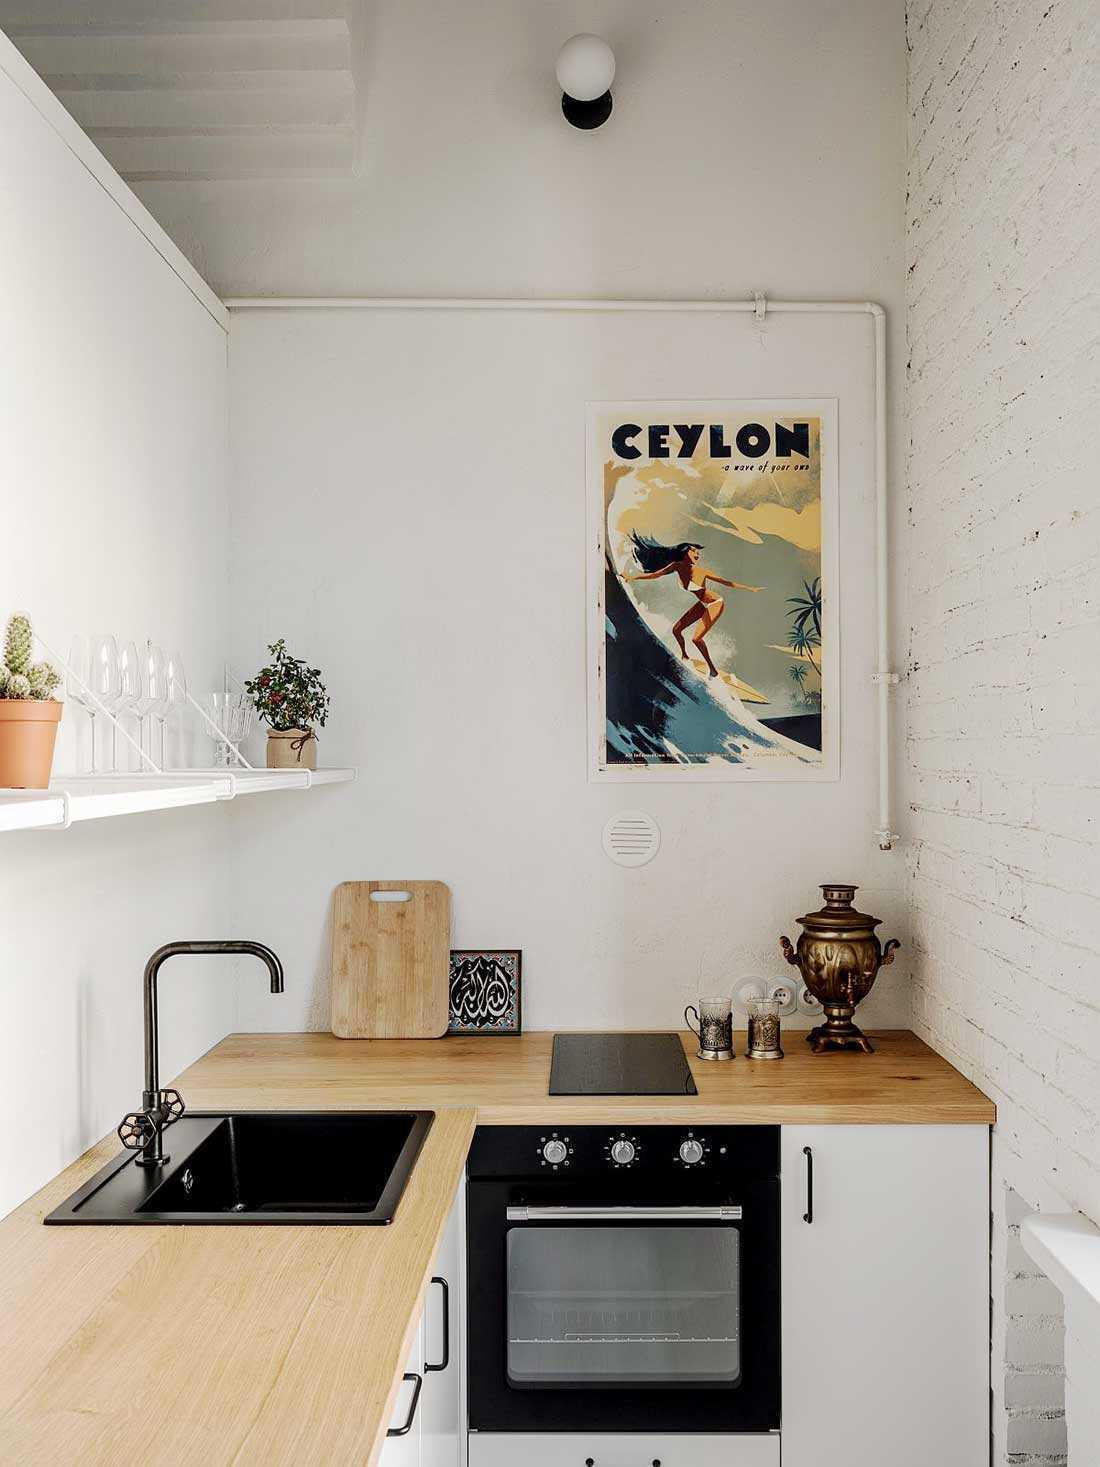 Desain interior dapur apartemen di Moskow karya Buro5 // decoist.com